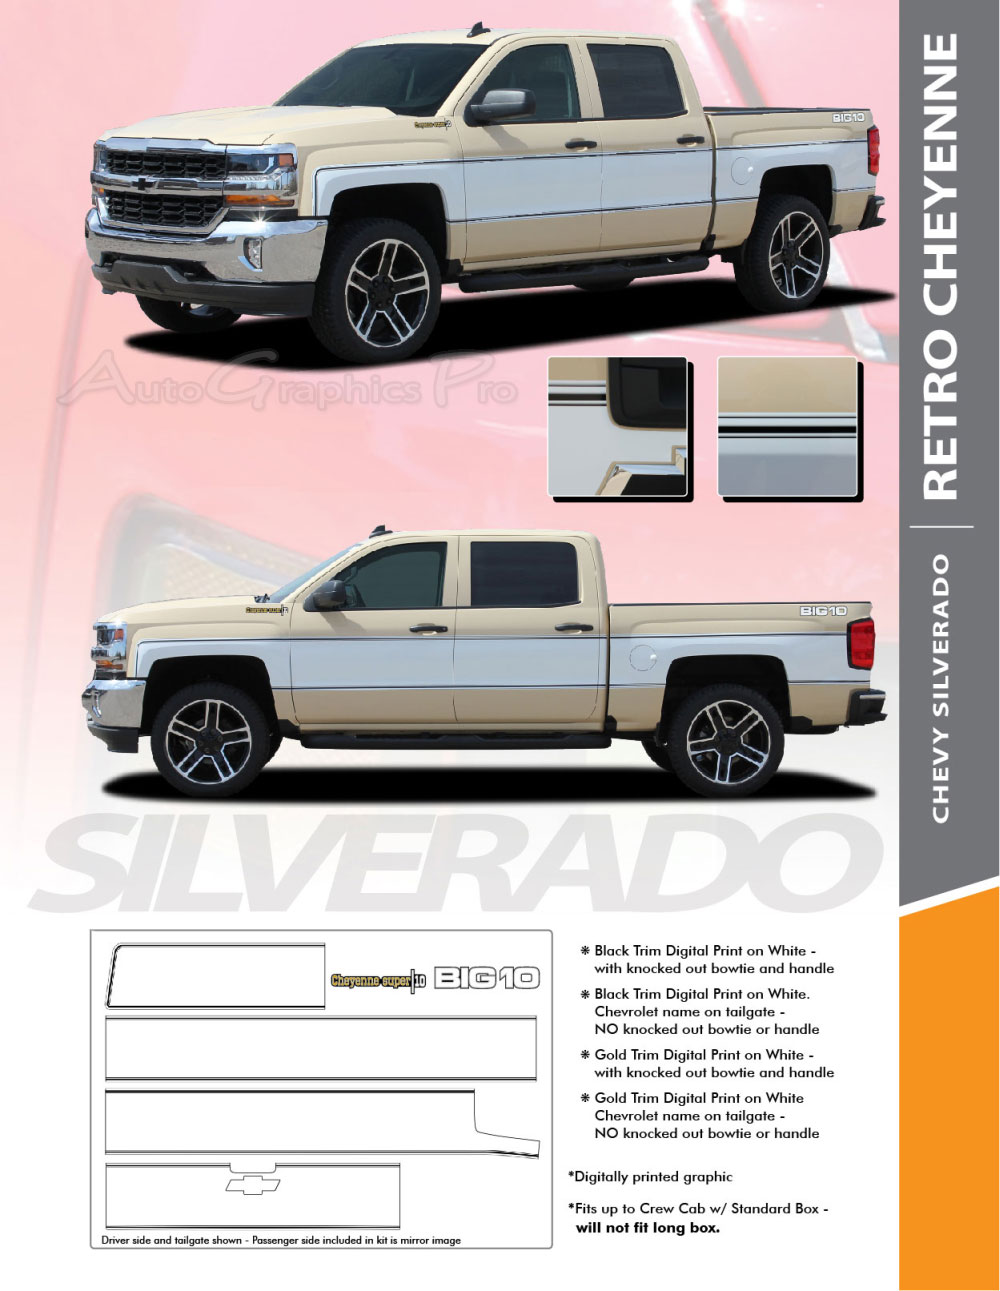 2014-2018 Chevy Silverado RETRO CHEYENNE Truck Stripes Mid-Body Accent  Decals Side Door Vinyl Graphics Kit